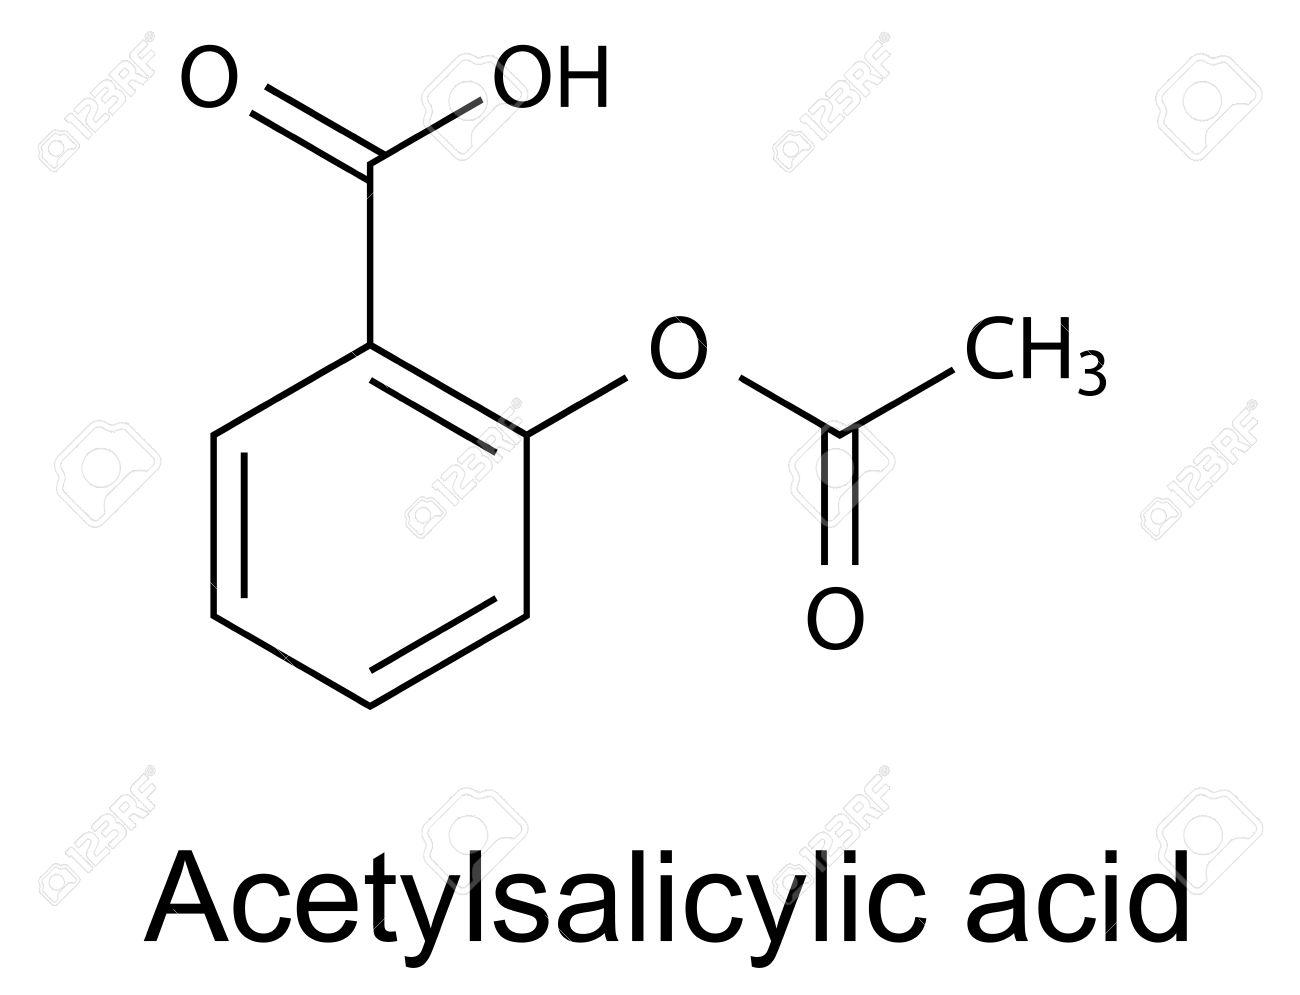 gafacom - acetylsalicylic acid